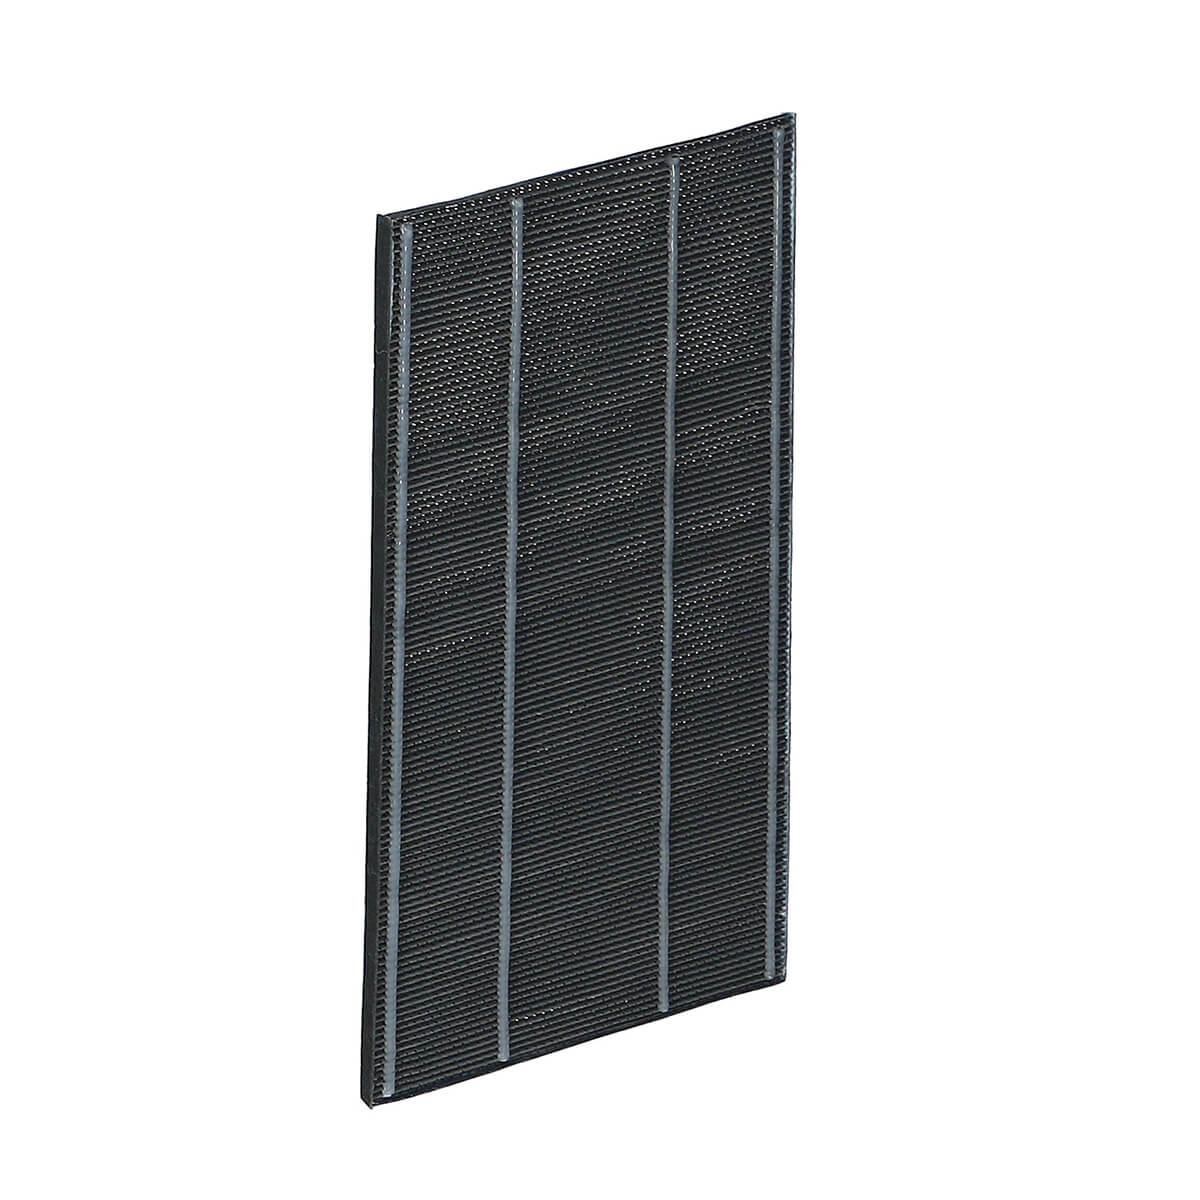 Sharp KC-A60EUW - filtr węglowy